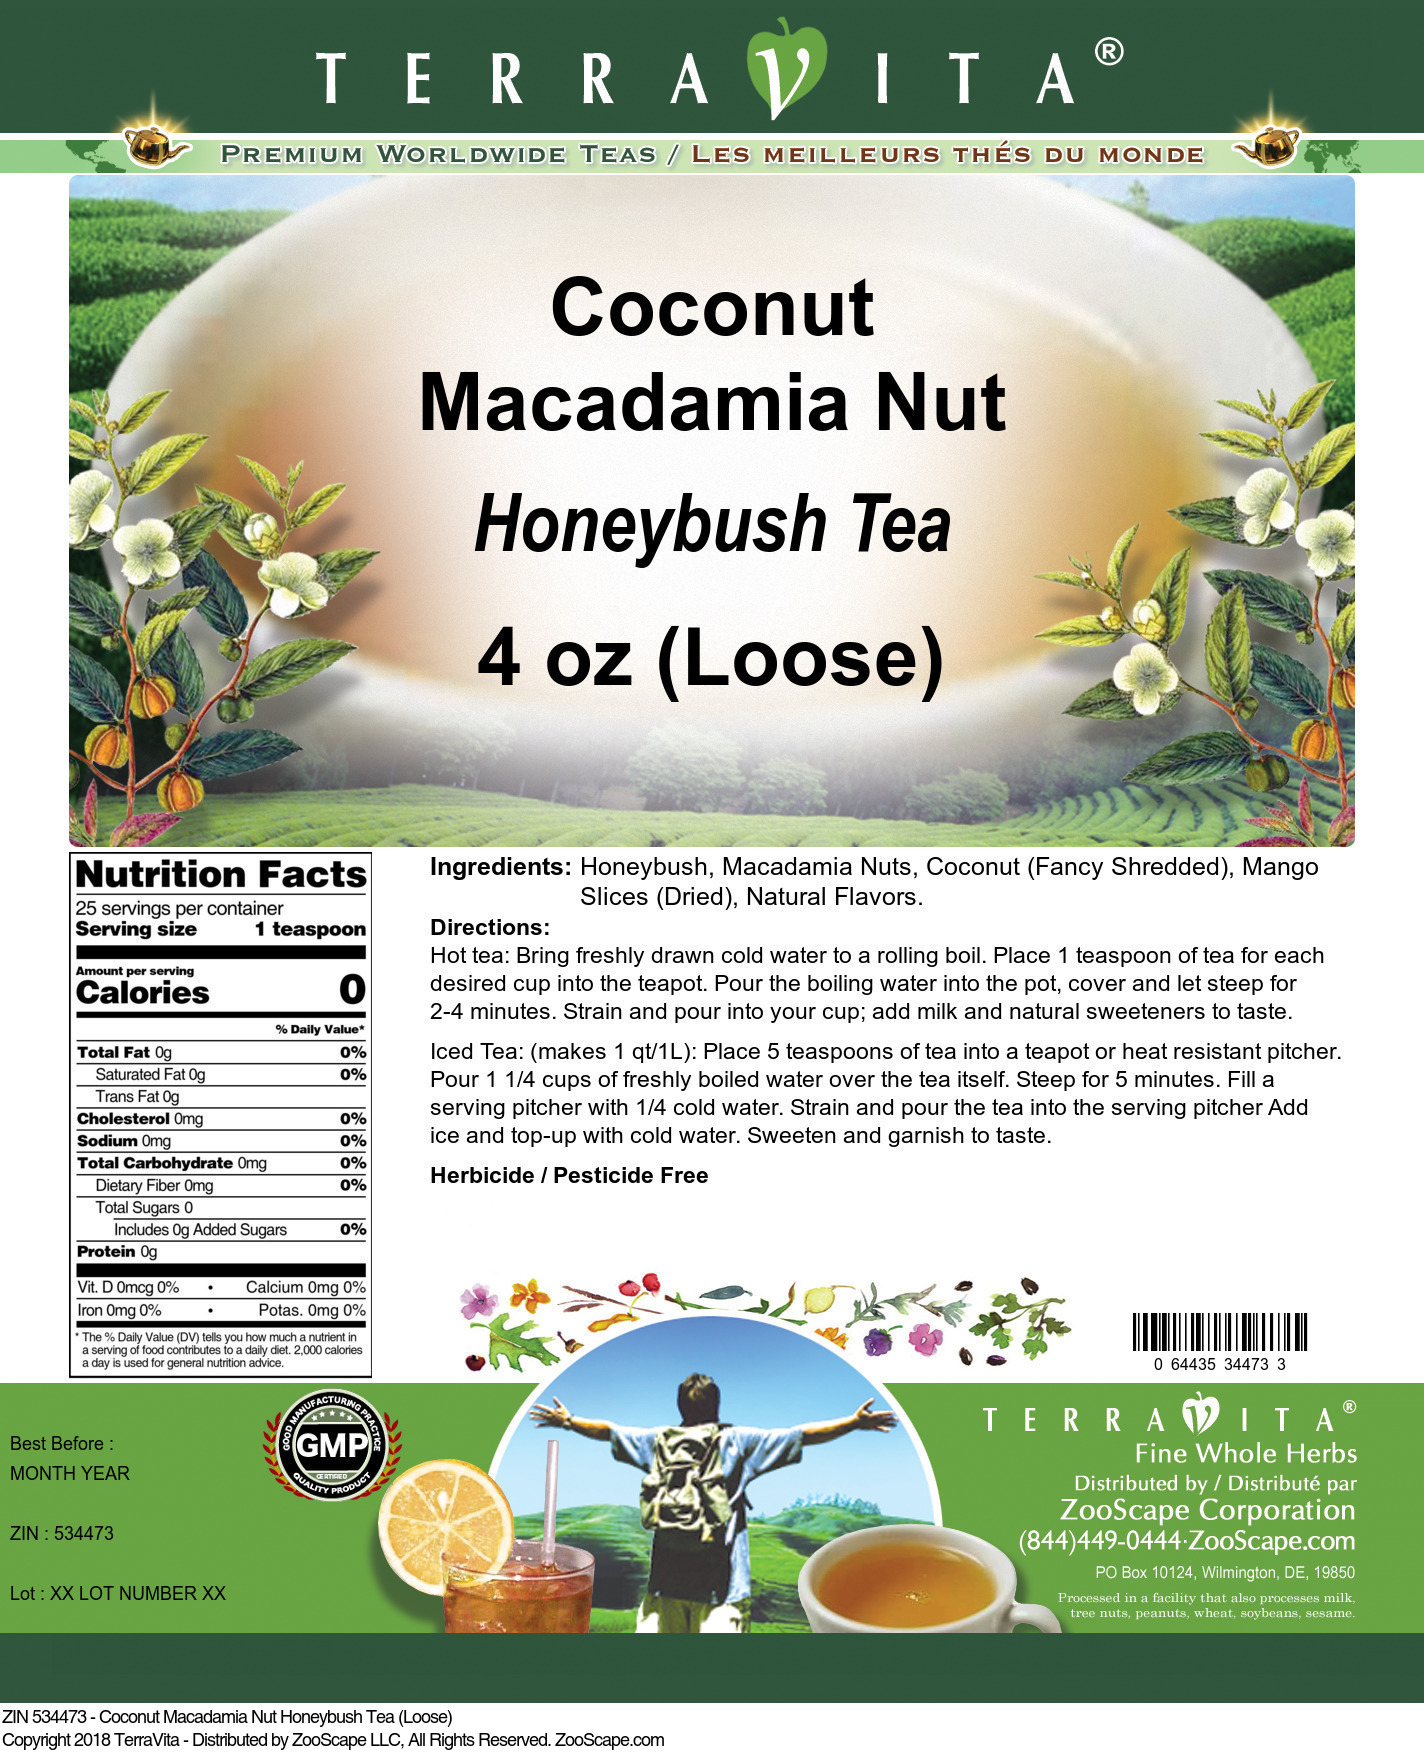 Coconut Macadamia Nut Honeybush Tea (Loose)